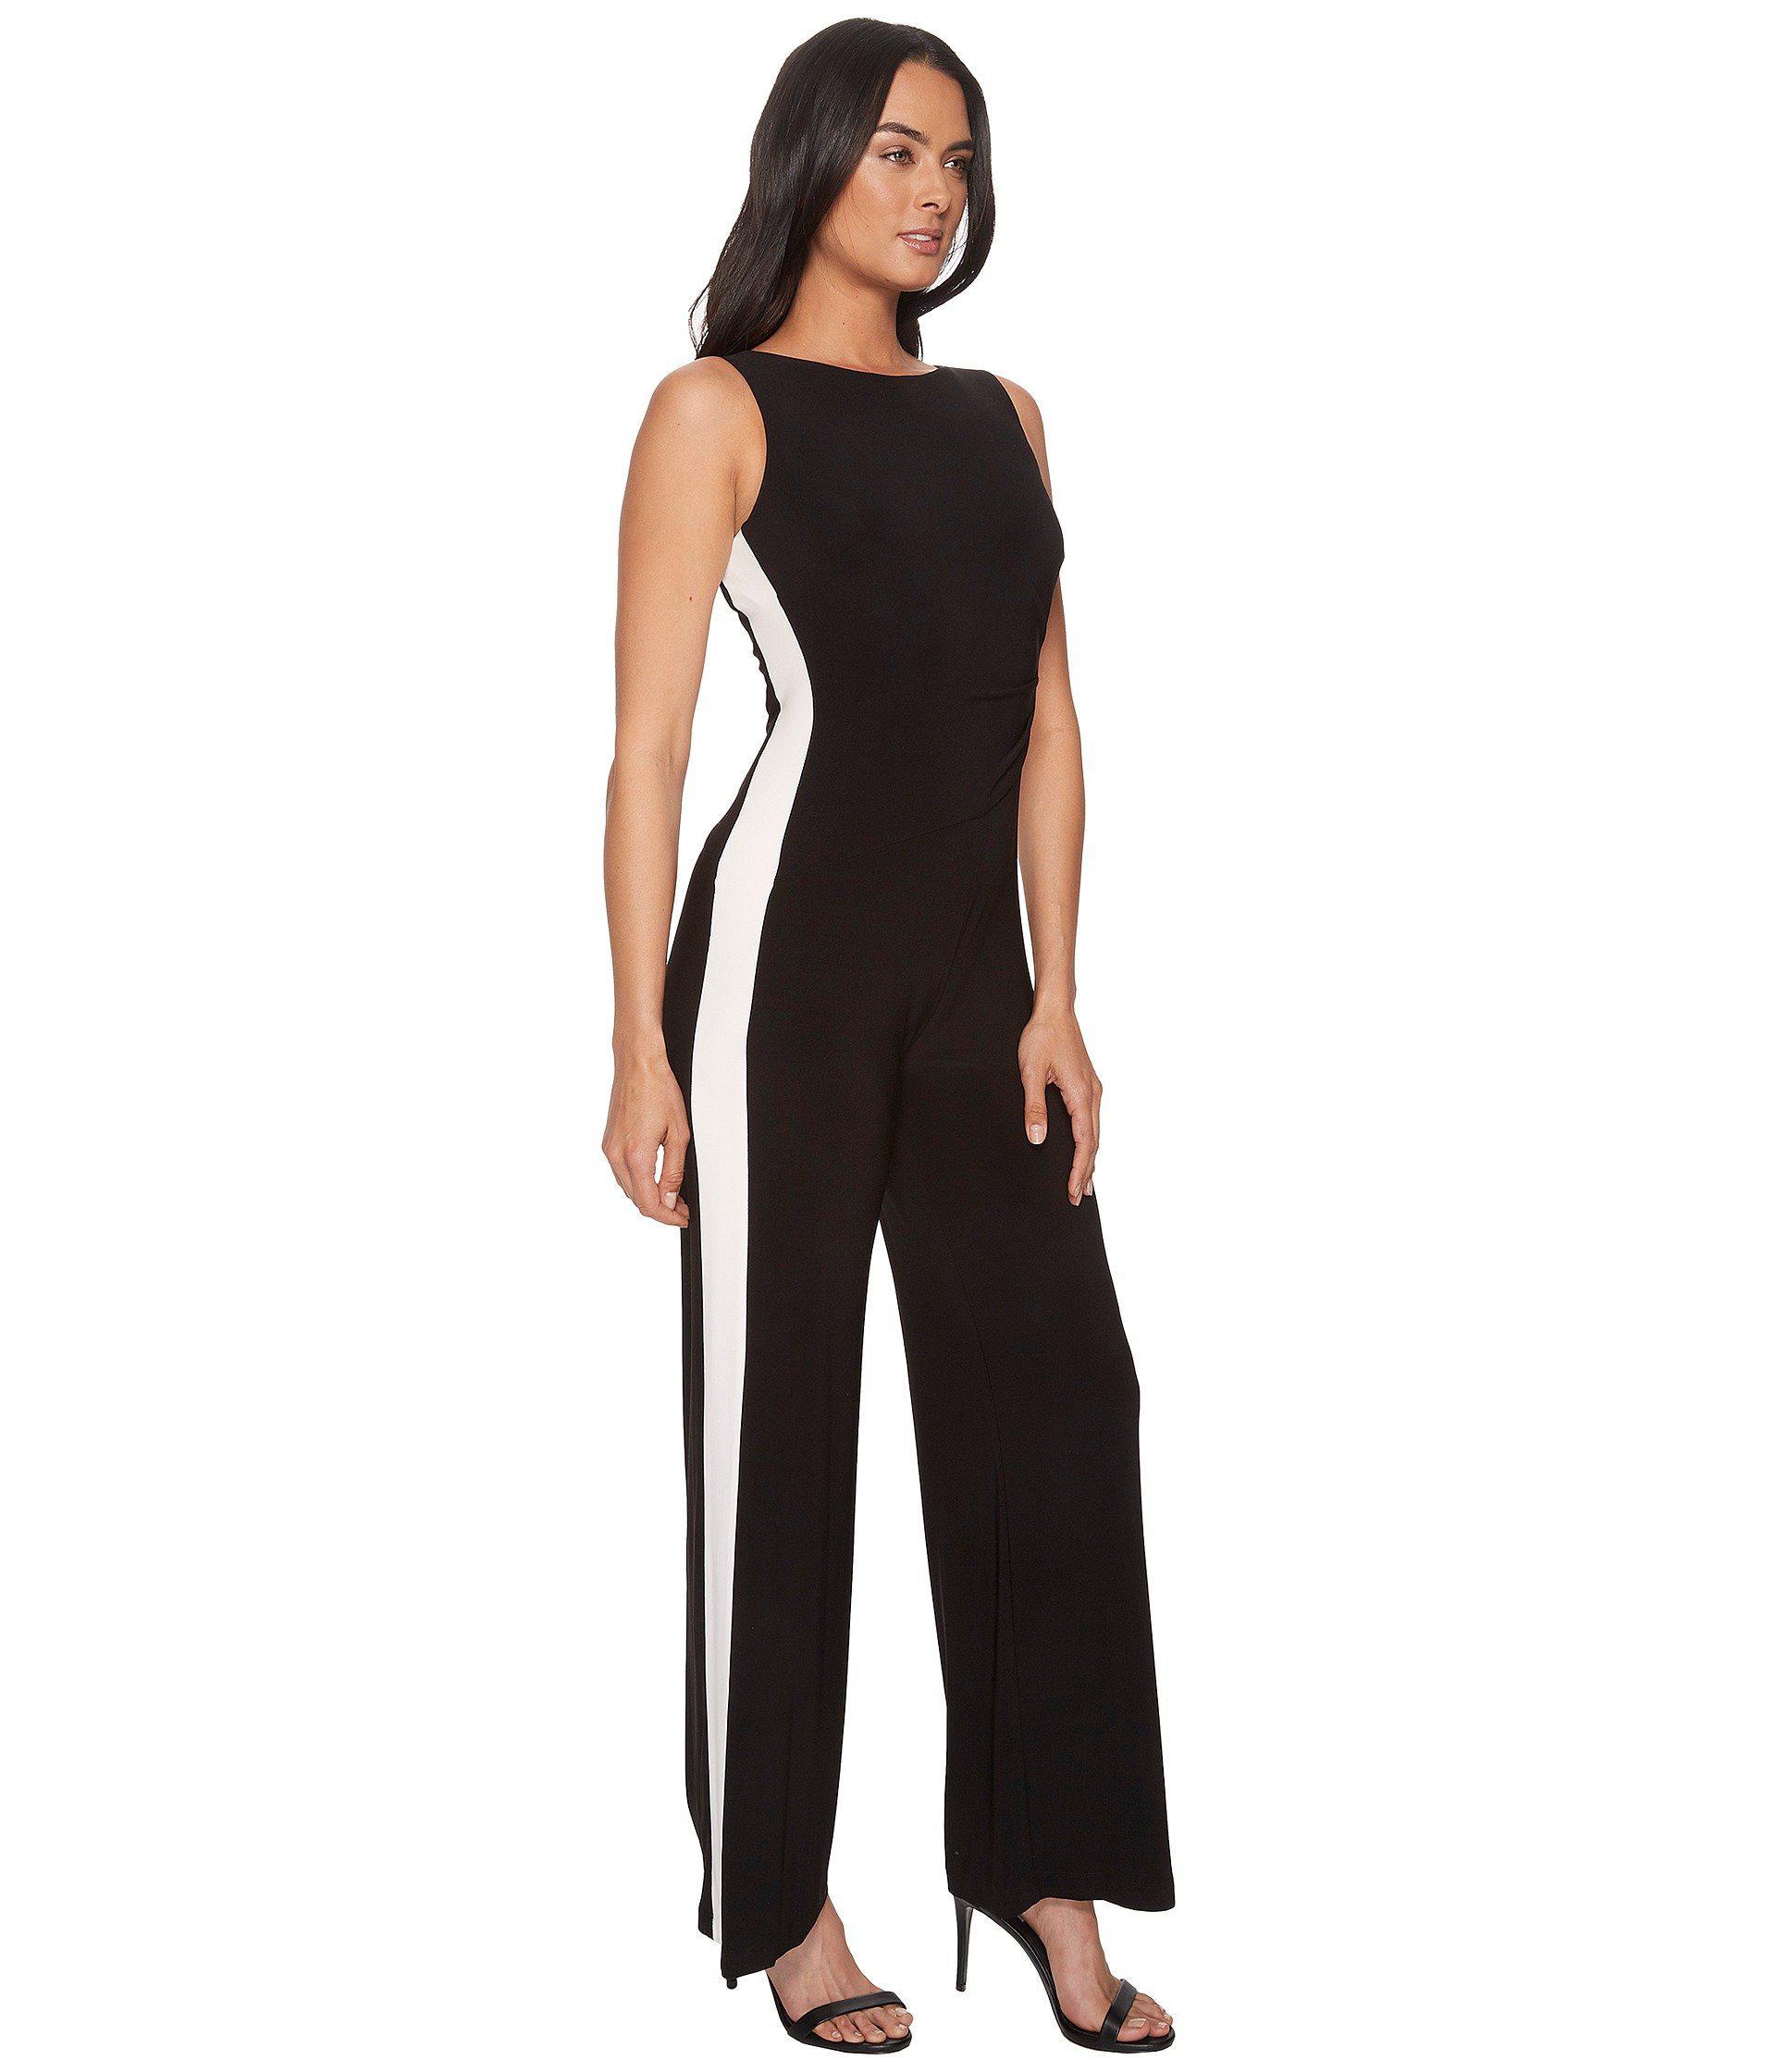 ac385ddefac Lauren by Ralph Lauren - Black Shah Two-tone Matte Jersey Jumpsuit - Lyst.  View fullscreen